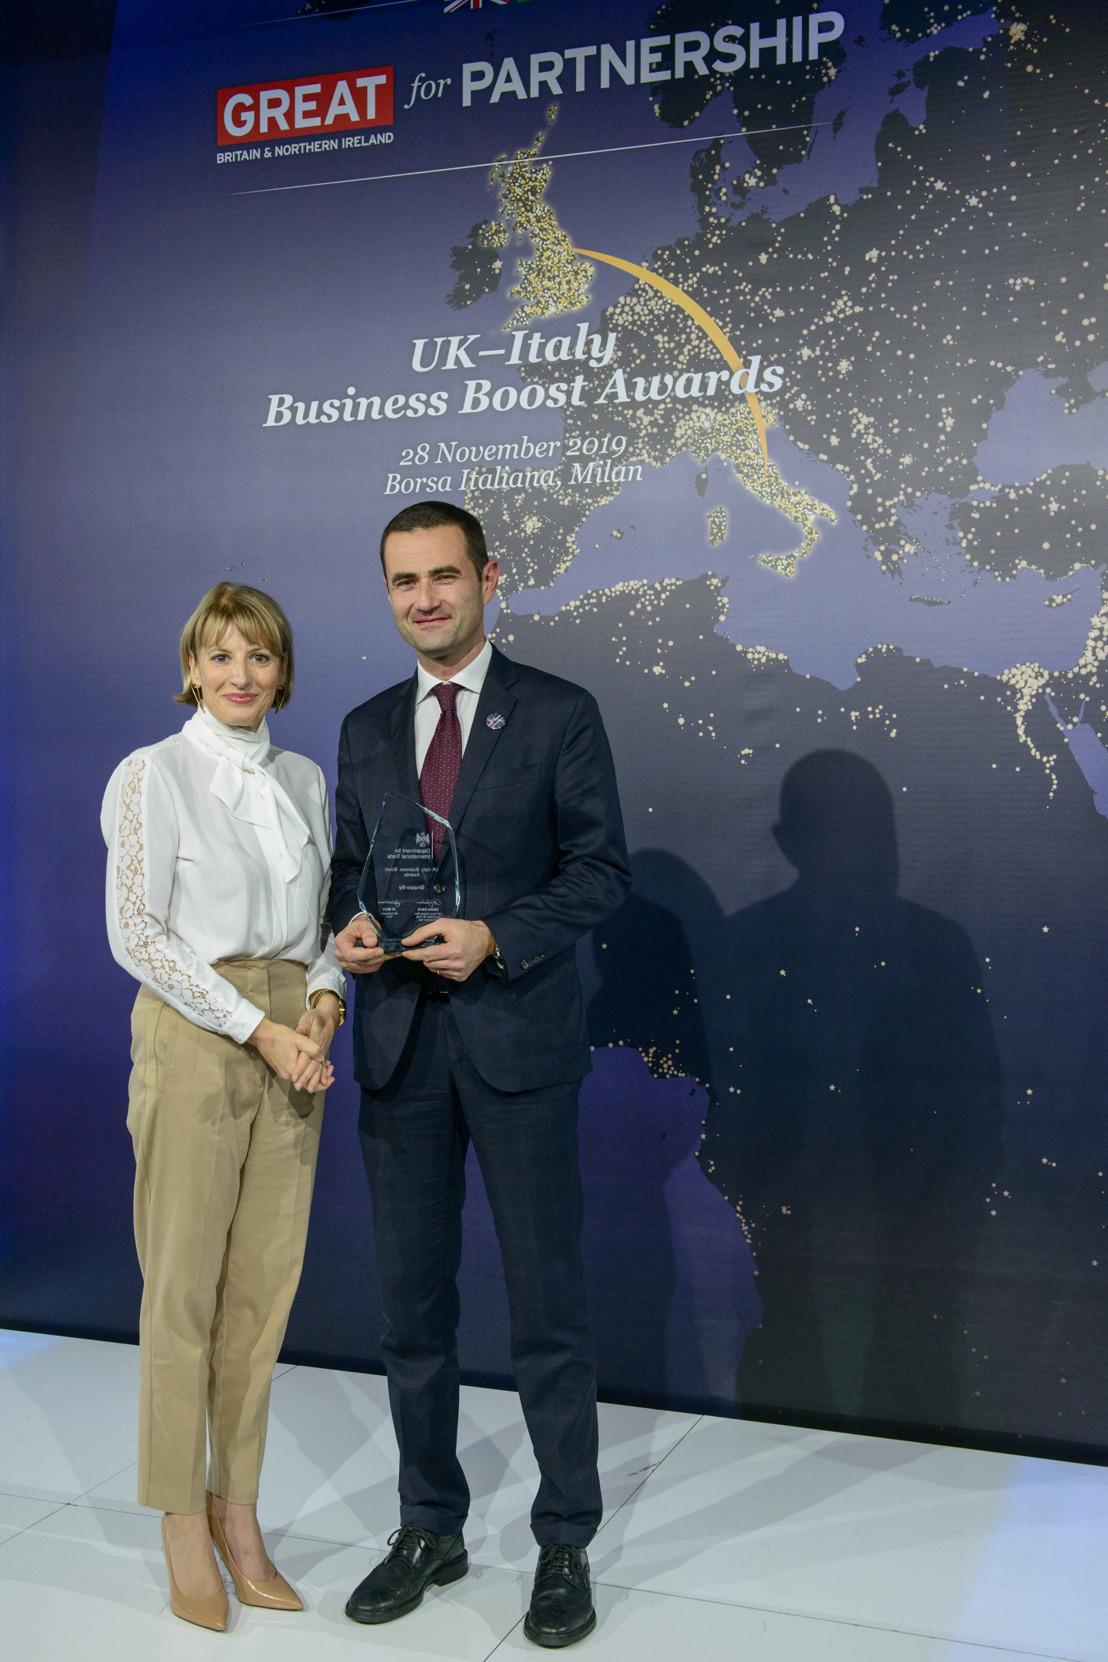 Al Gruppo illy il premio UK-Italy Business Boost Award